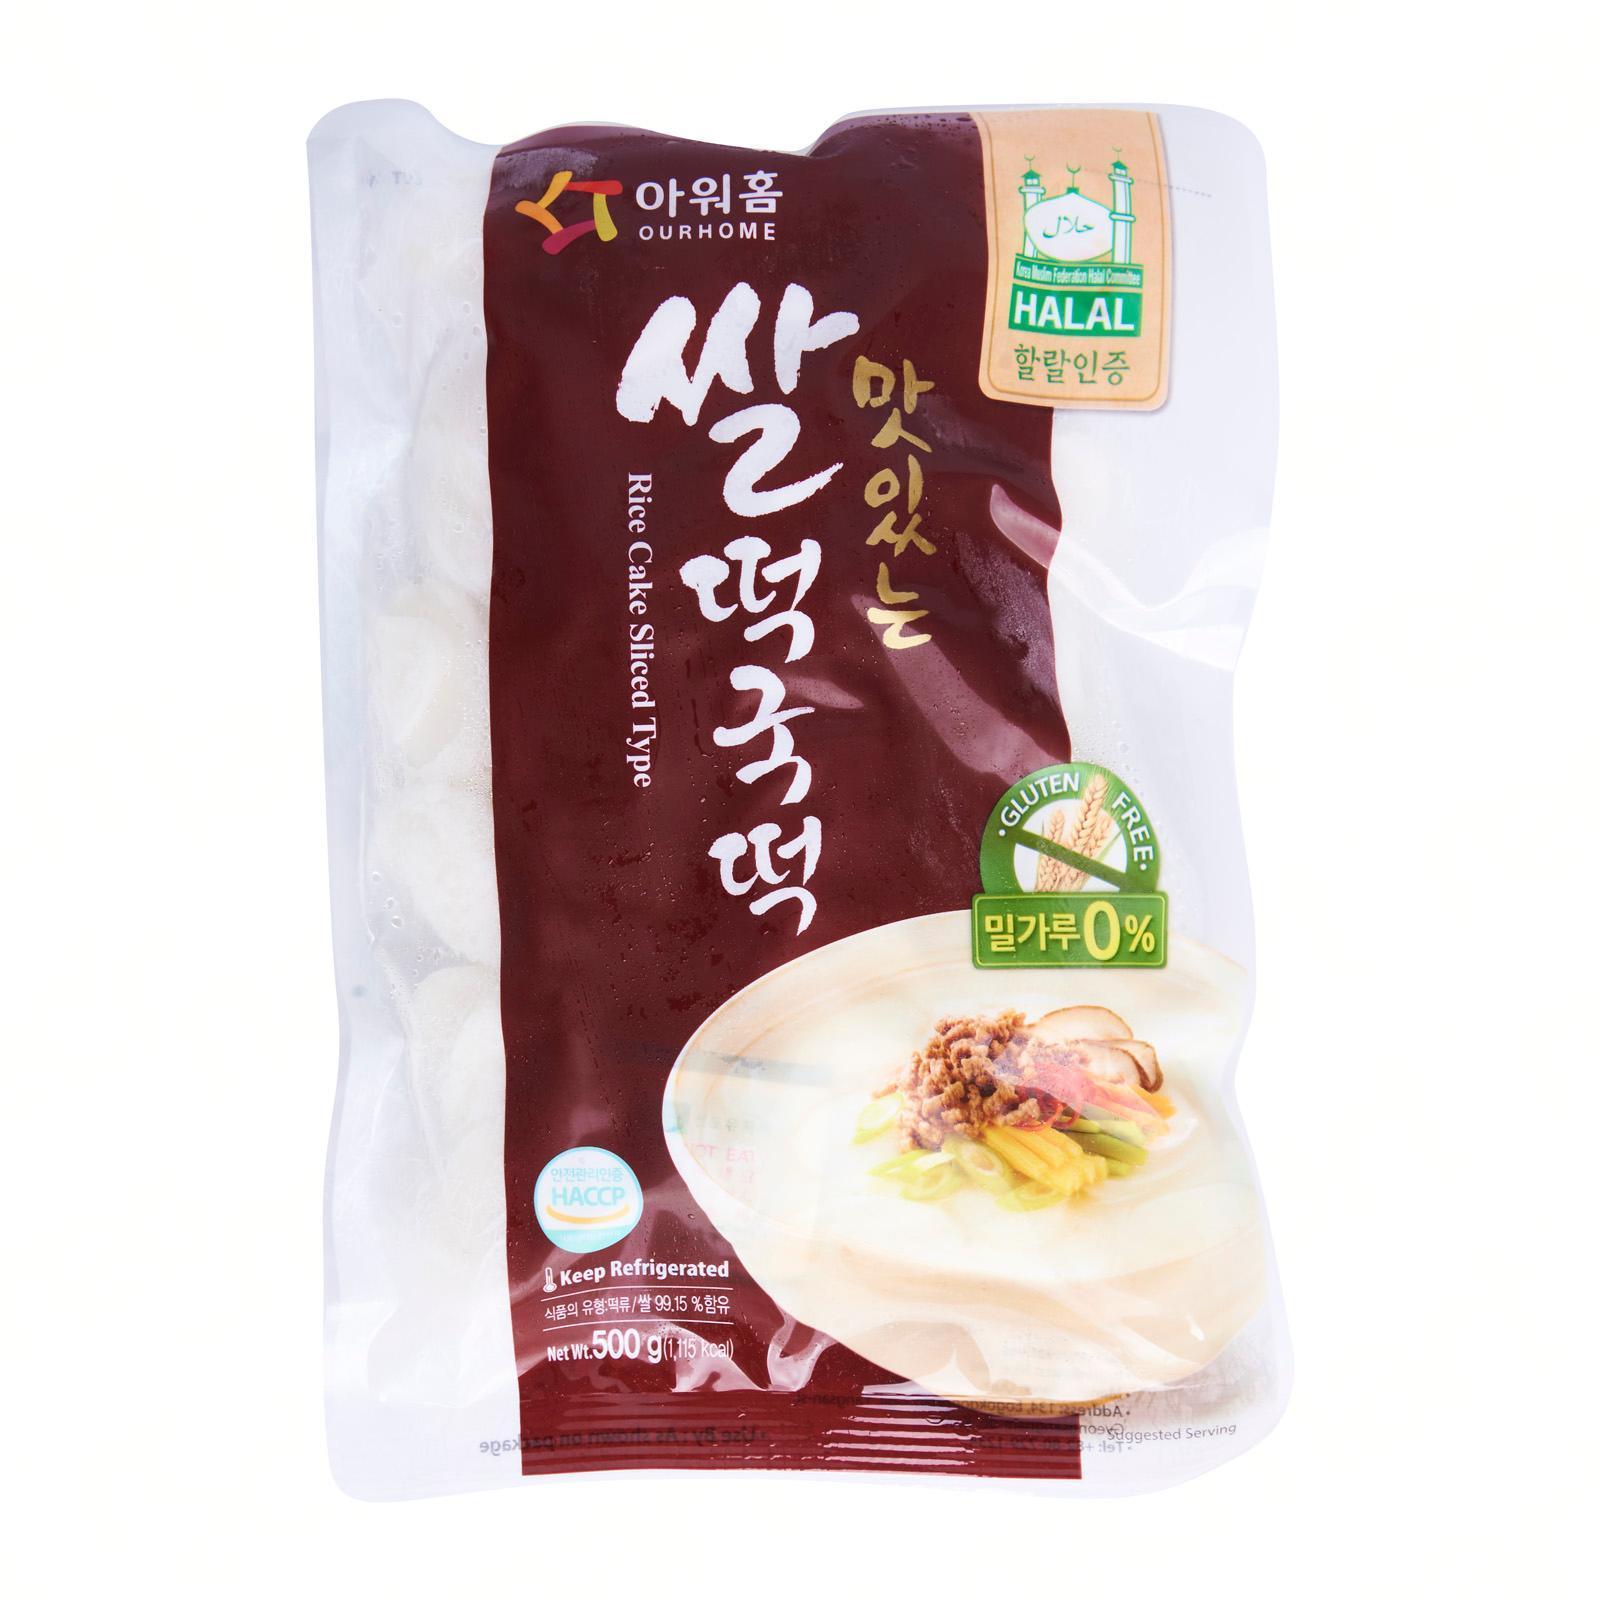 OURHOME Sliced Rice Cake - Korean